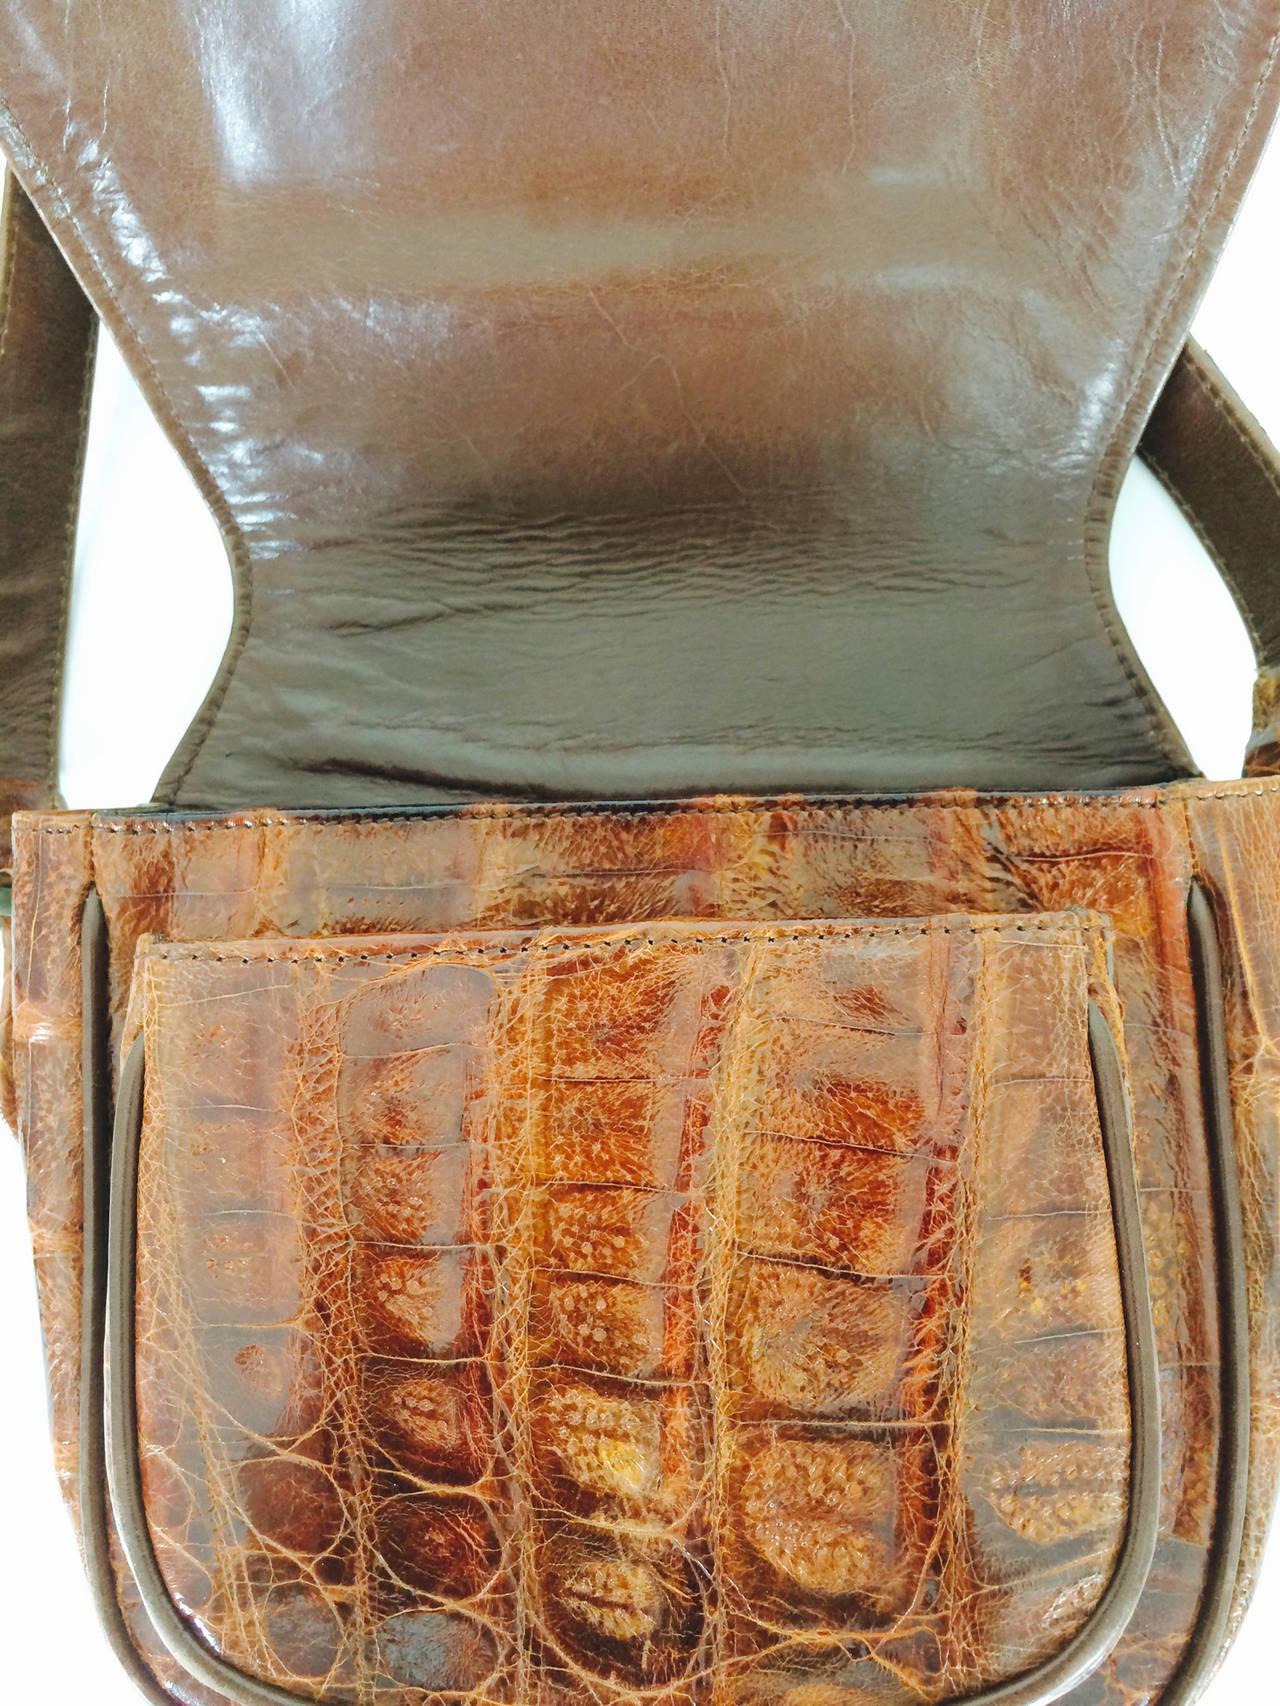 Saddle bag handbag cognac leather faux alligator Neiman Marcus 1980s 6